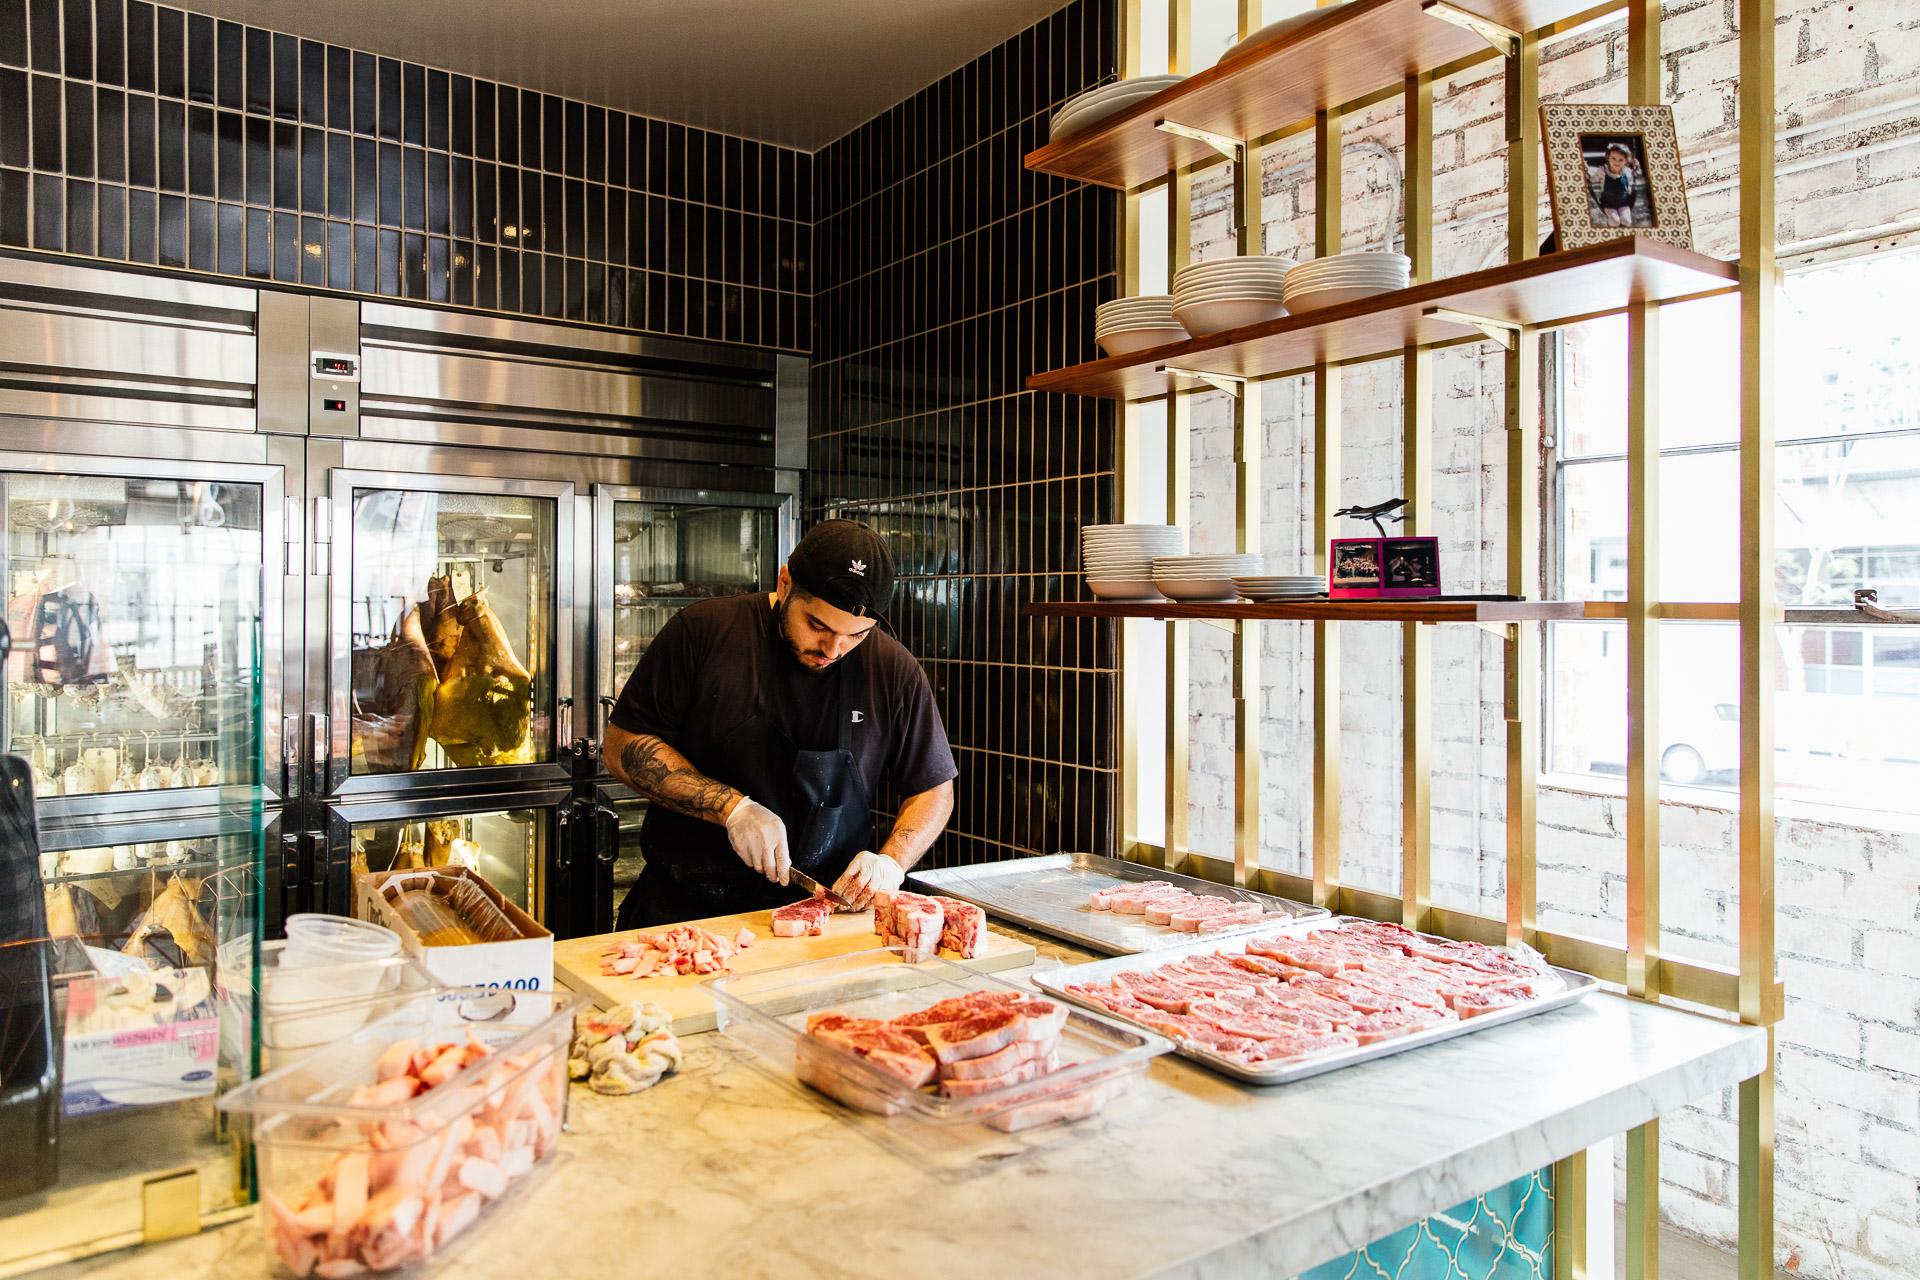 Bavel restaurant in DTLA Arts District / Award winning design by Studio Unltd / Photography by Tanveer Badal